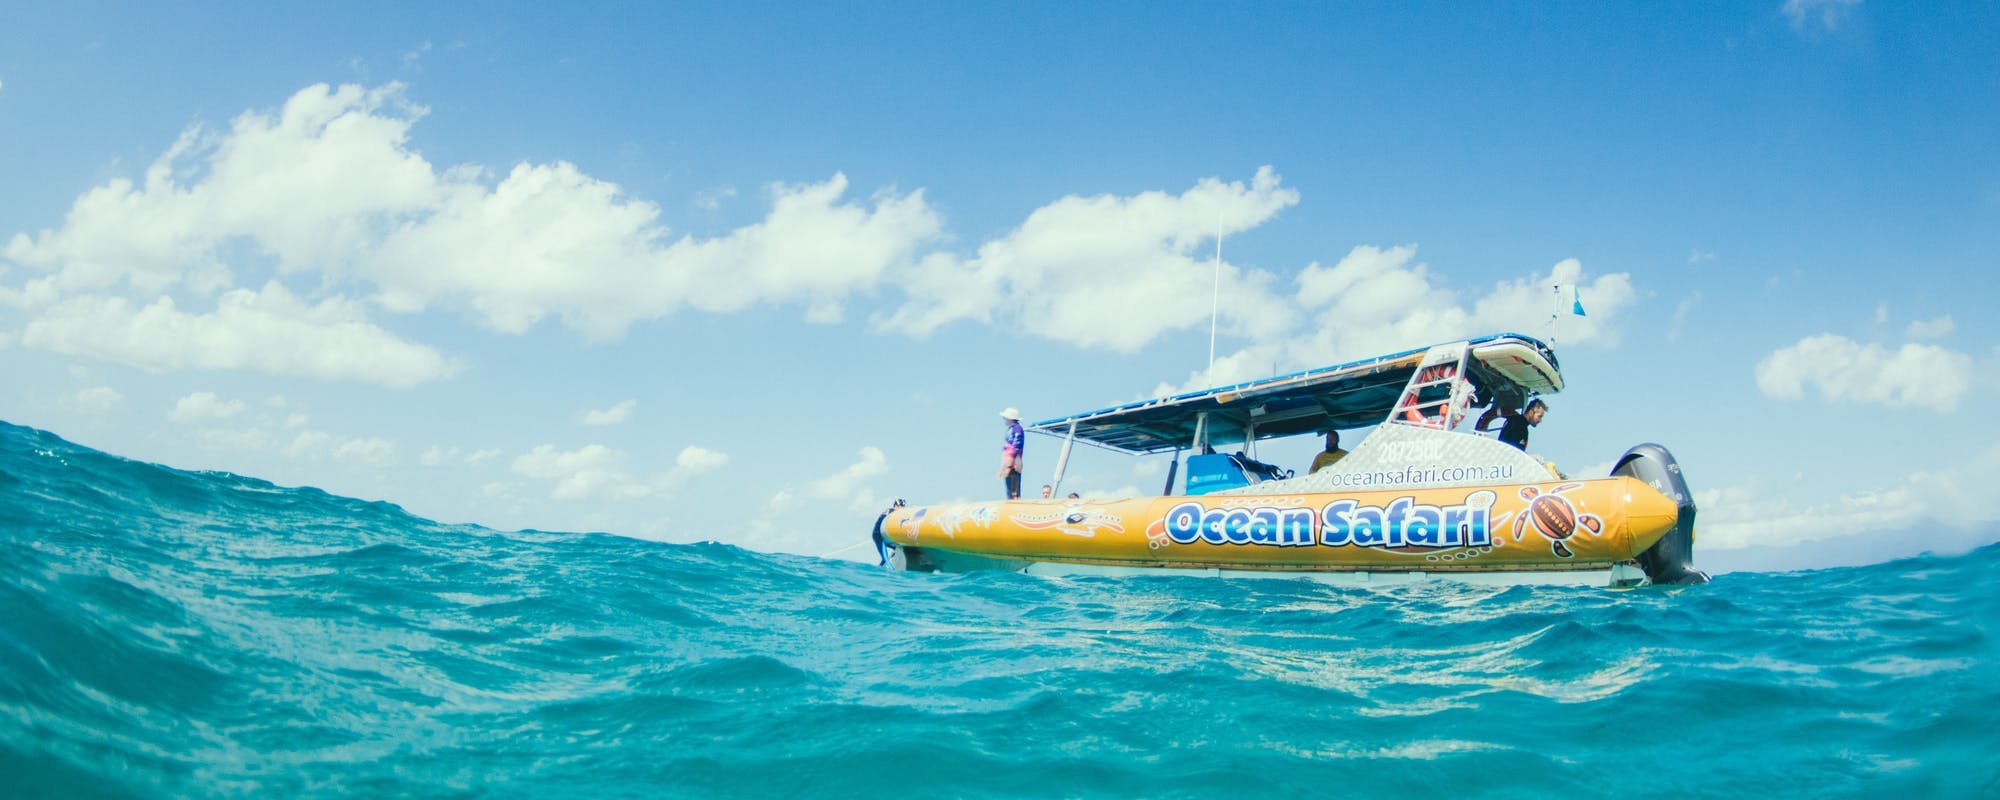 ocean safari cape tribulation